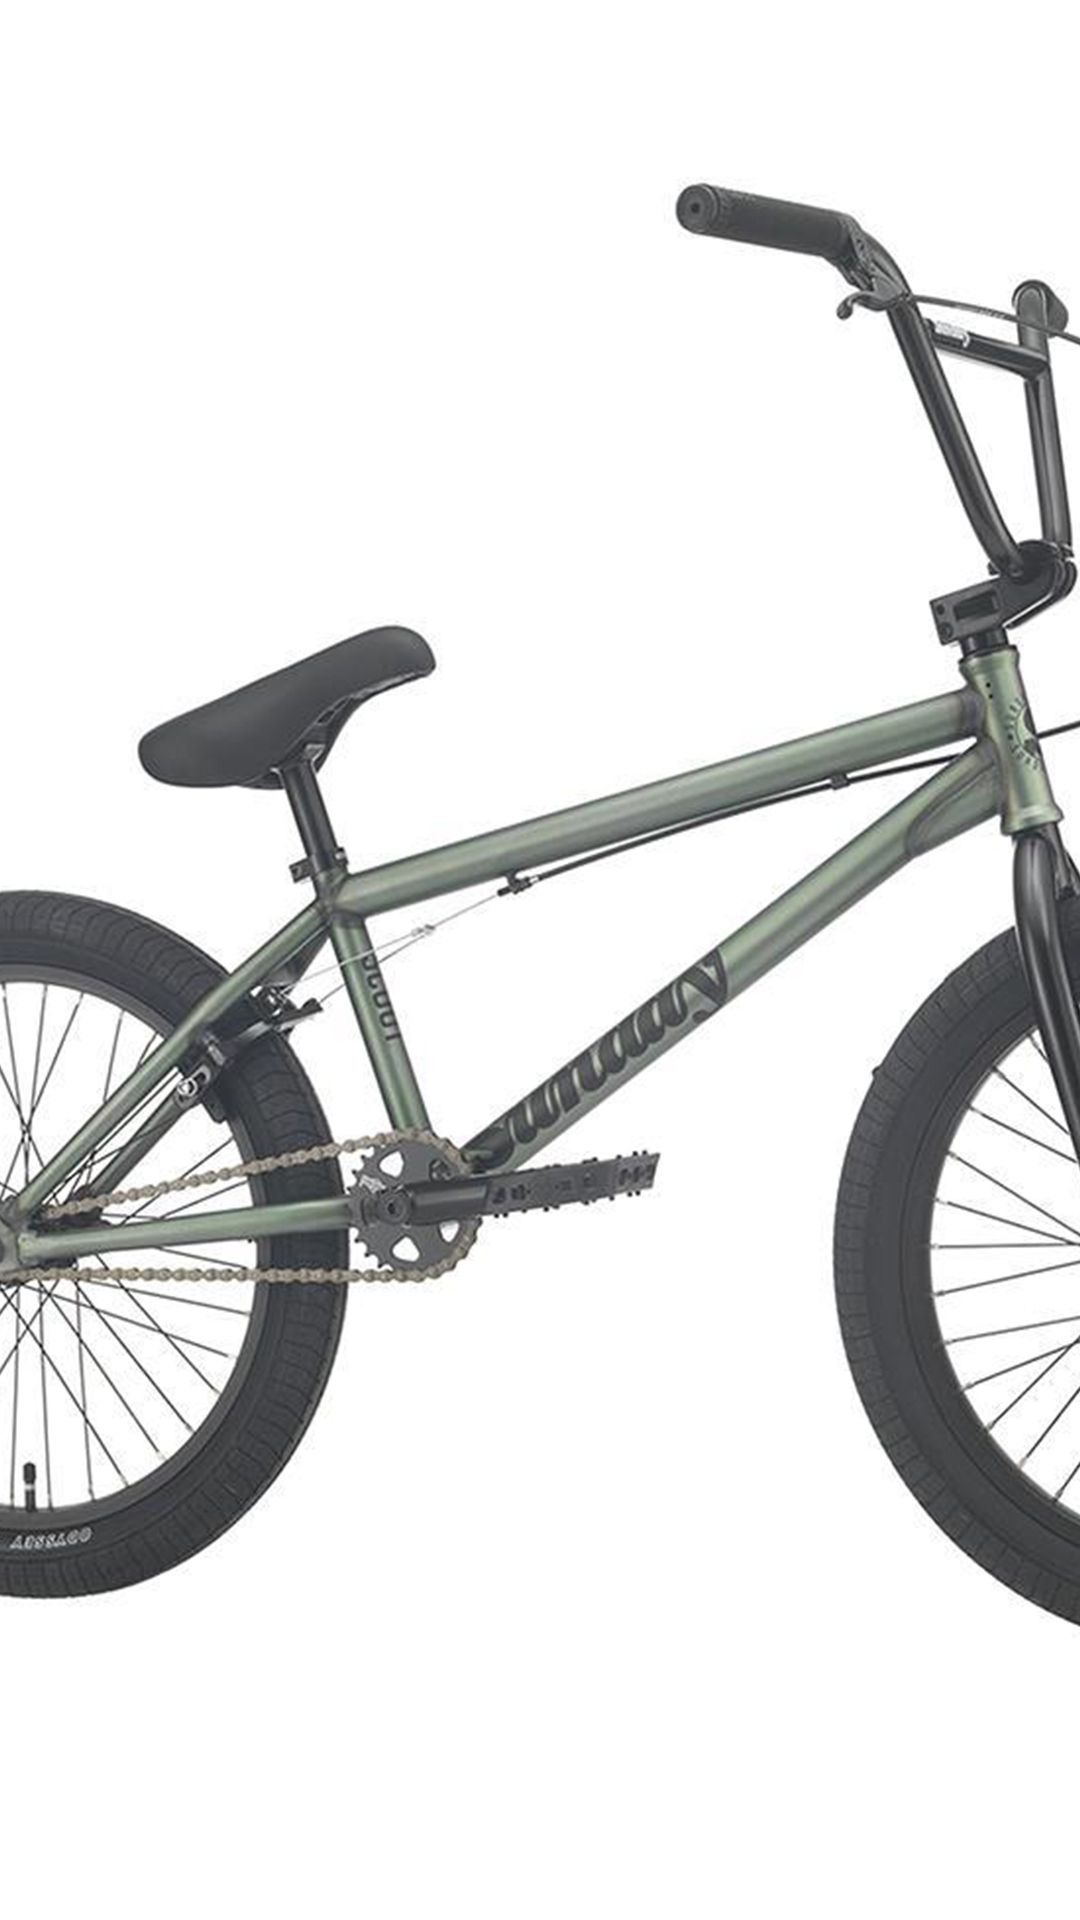 2021 Sunday Scout Frost Green In 2020 Beginner Bike Bmx Bikes Scout